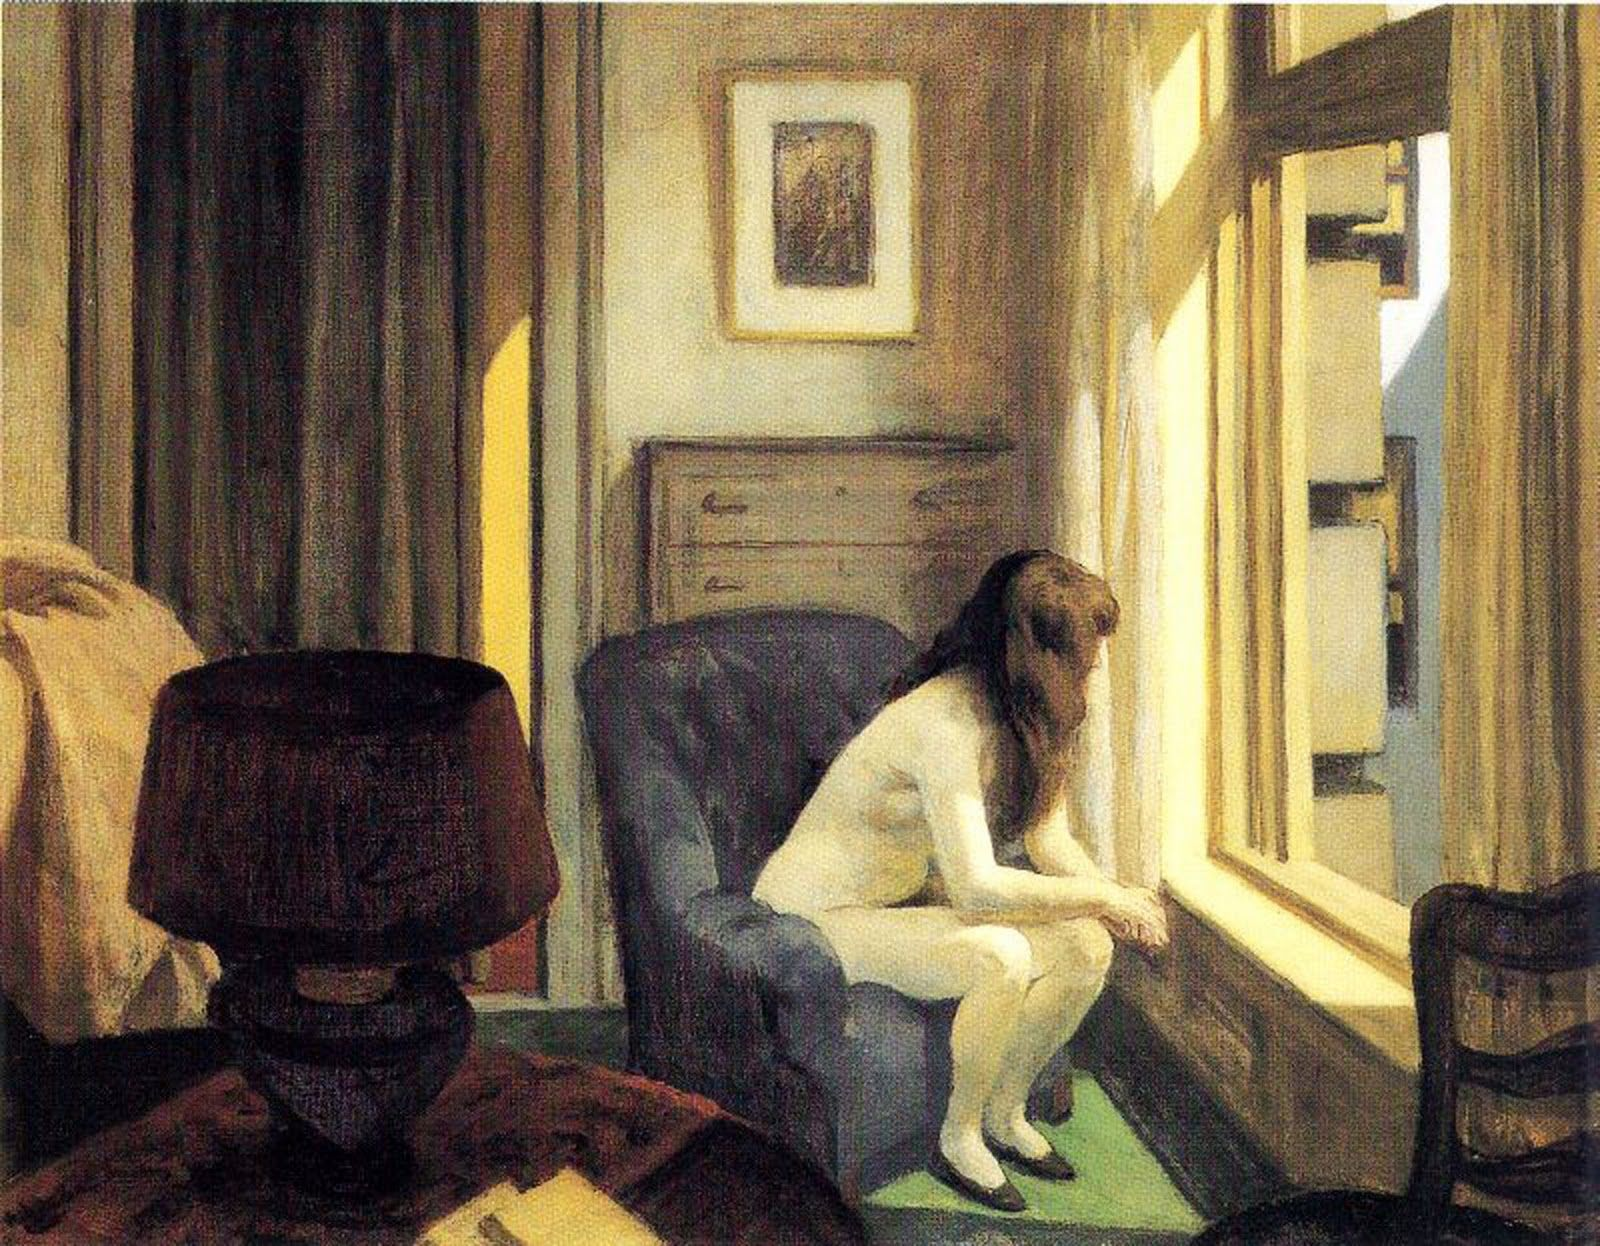 11 am – Edward Hopper, 1926